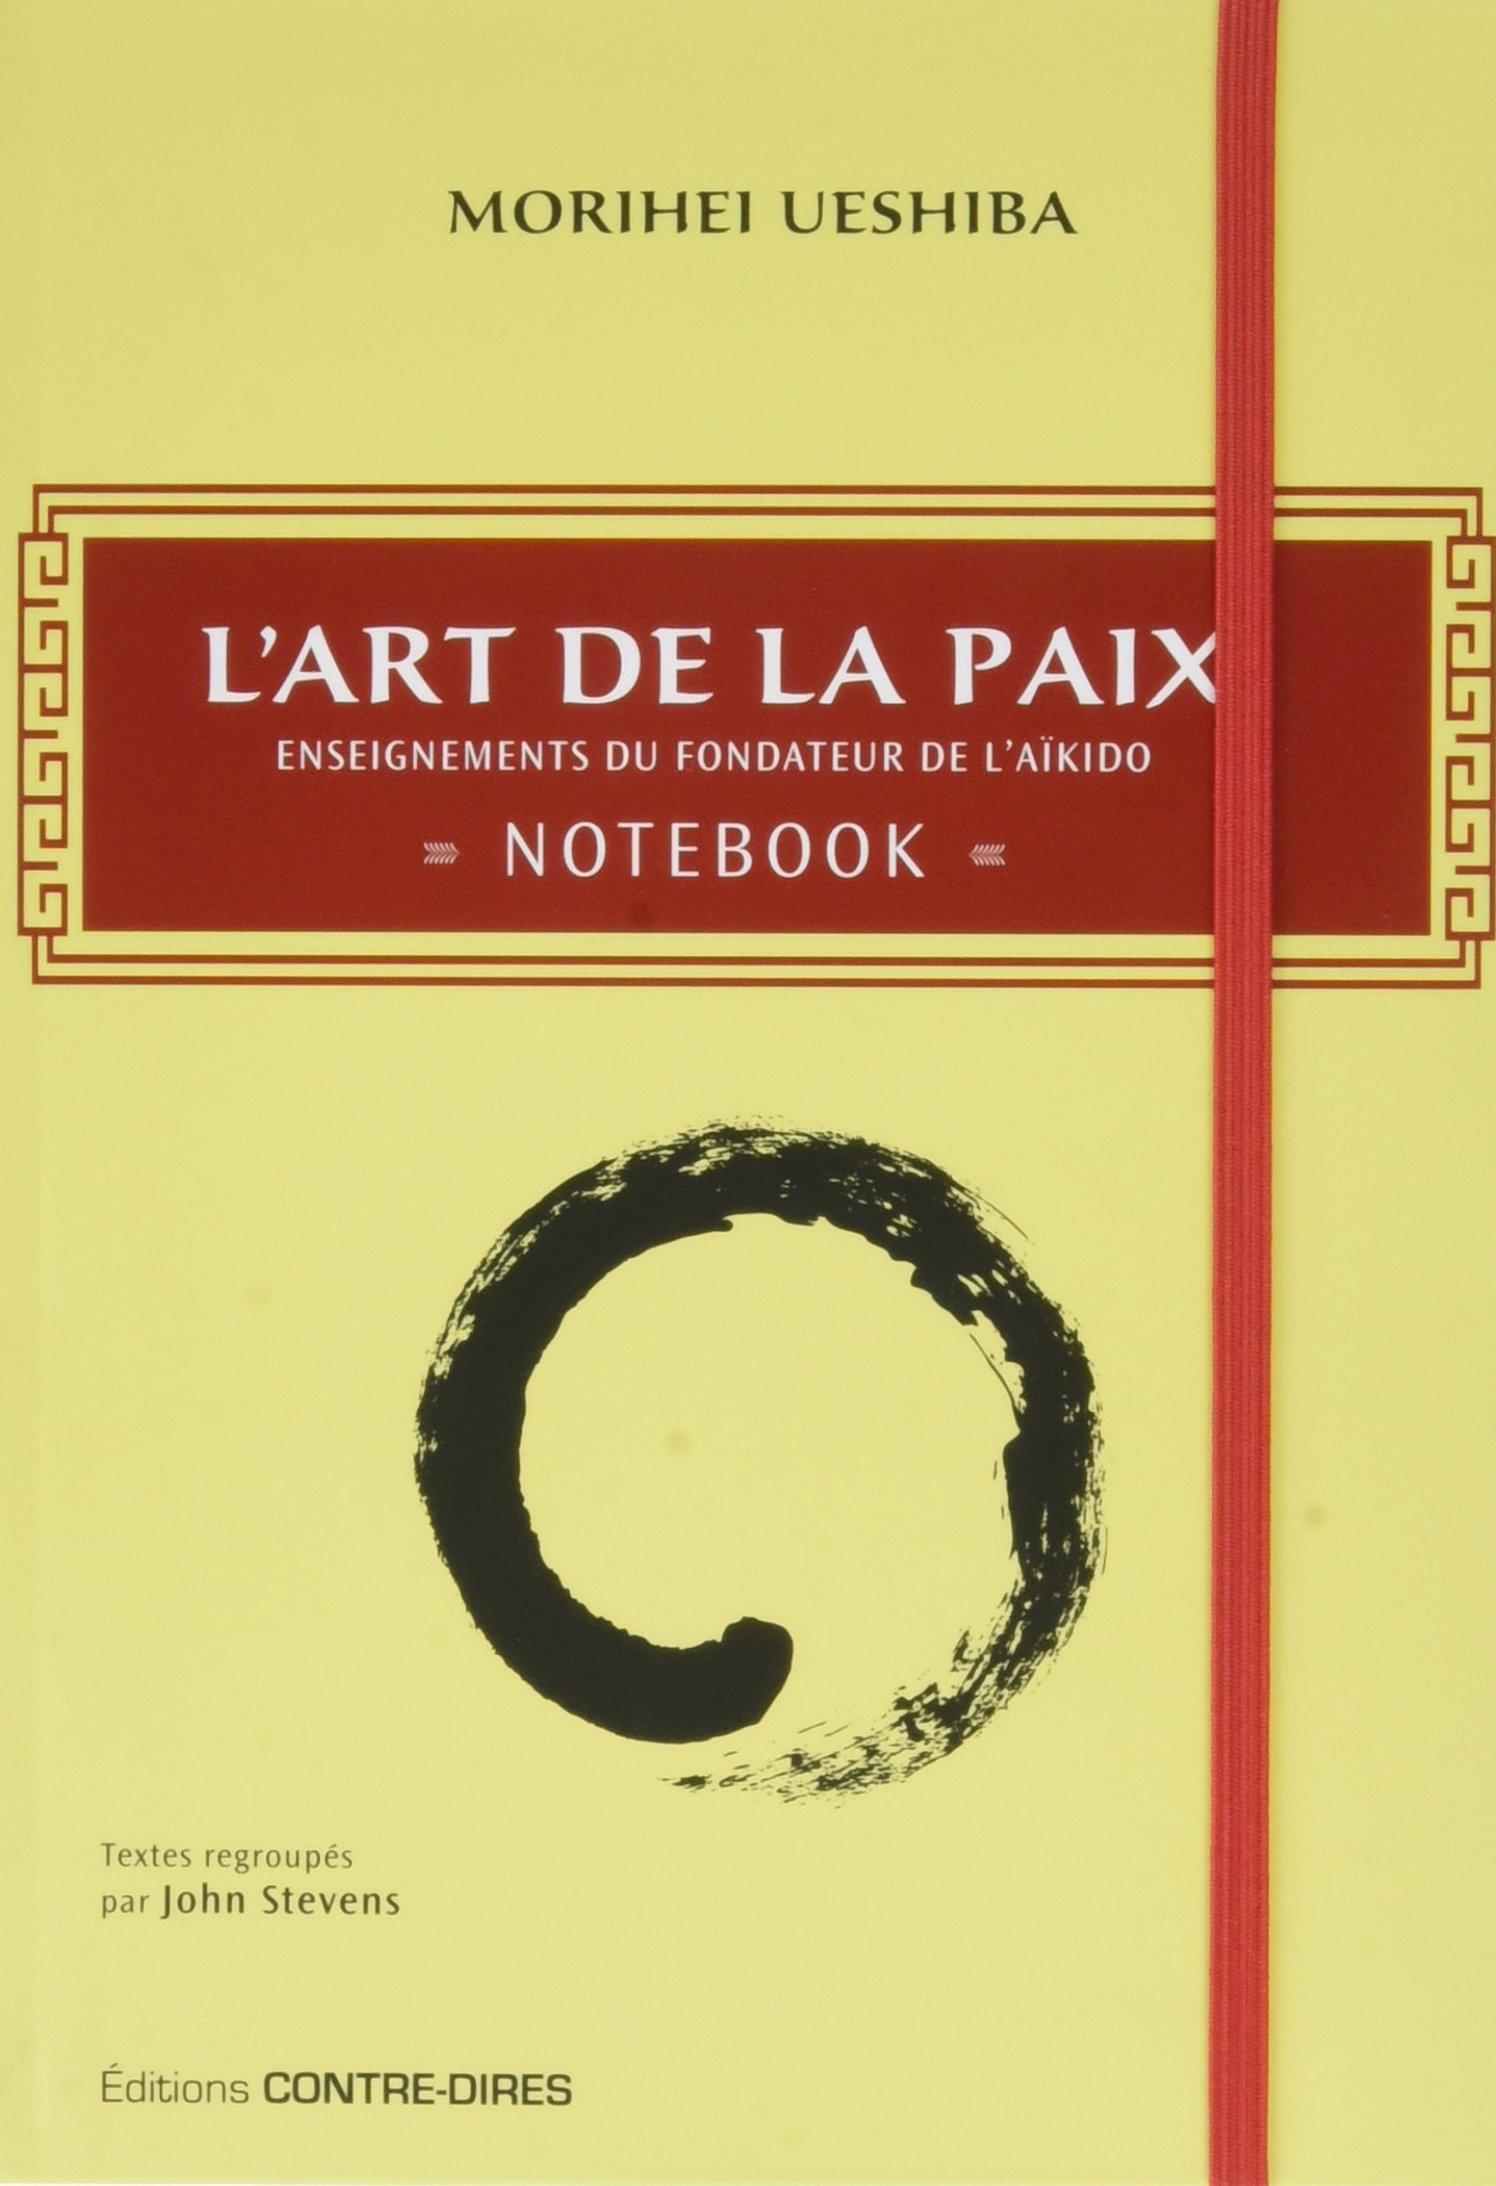 L'art de la paix : Notebook Relié – 6 octobre 2017 John Stevens Morihei Ueshiba Christophe Champclaux Editions Contre-dires